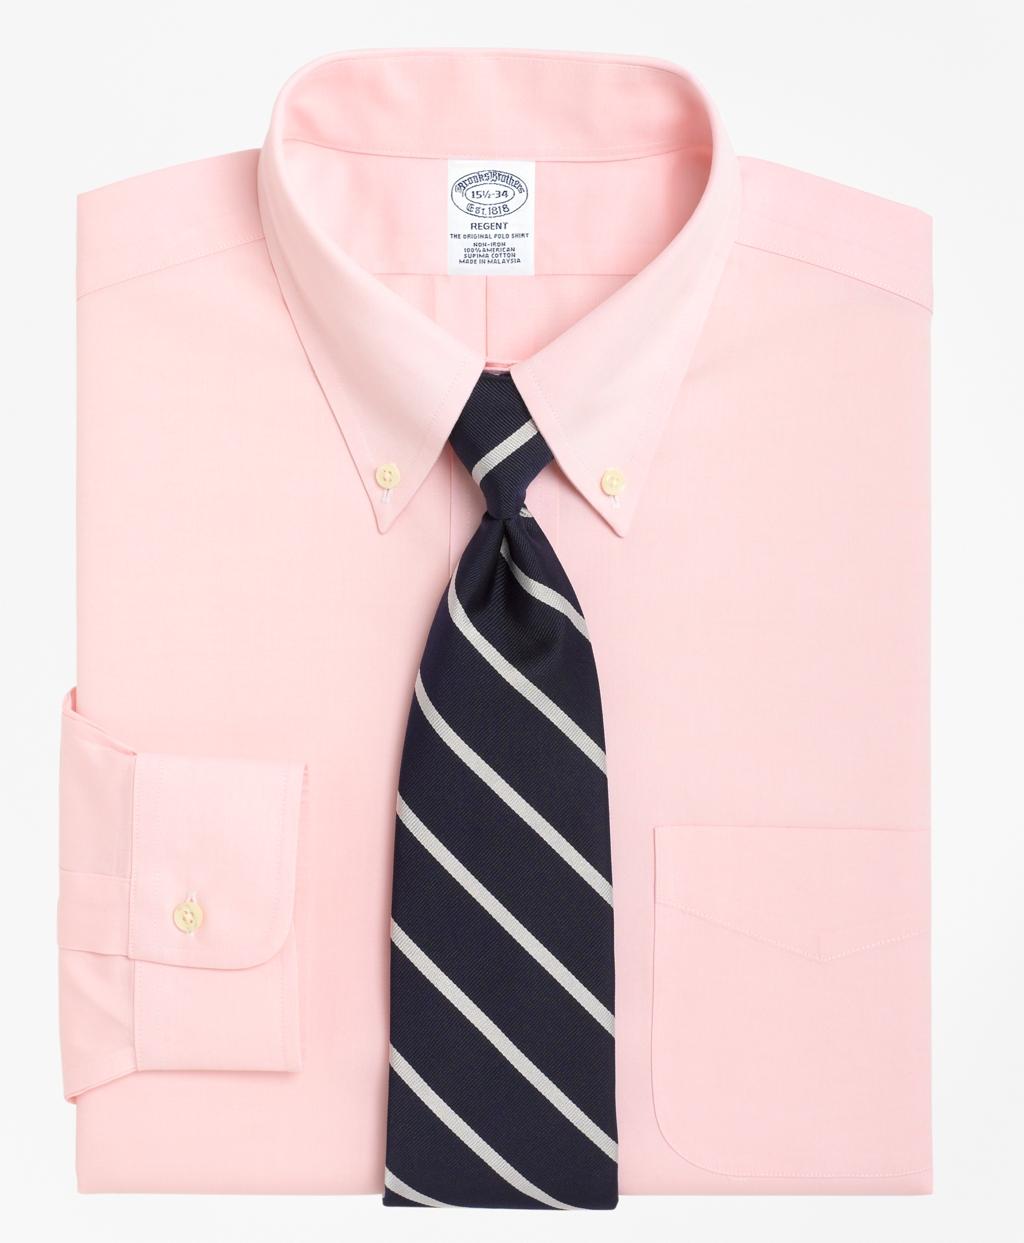 1930s Mens Shirts | Dress Shirts, Polo Shirts, Work Shirts Brooks Brothers Mens Slim Fitted Dress Shirt Non-Iron Button-Down Collar $92.00 AT vintagedancer.com